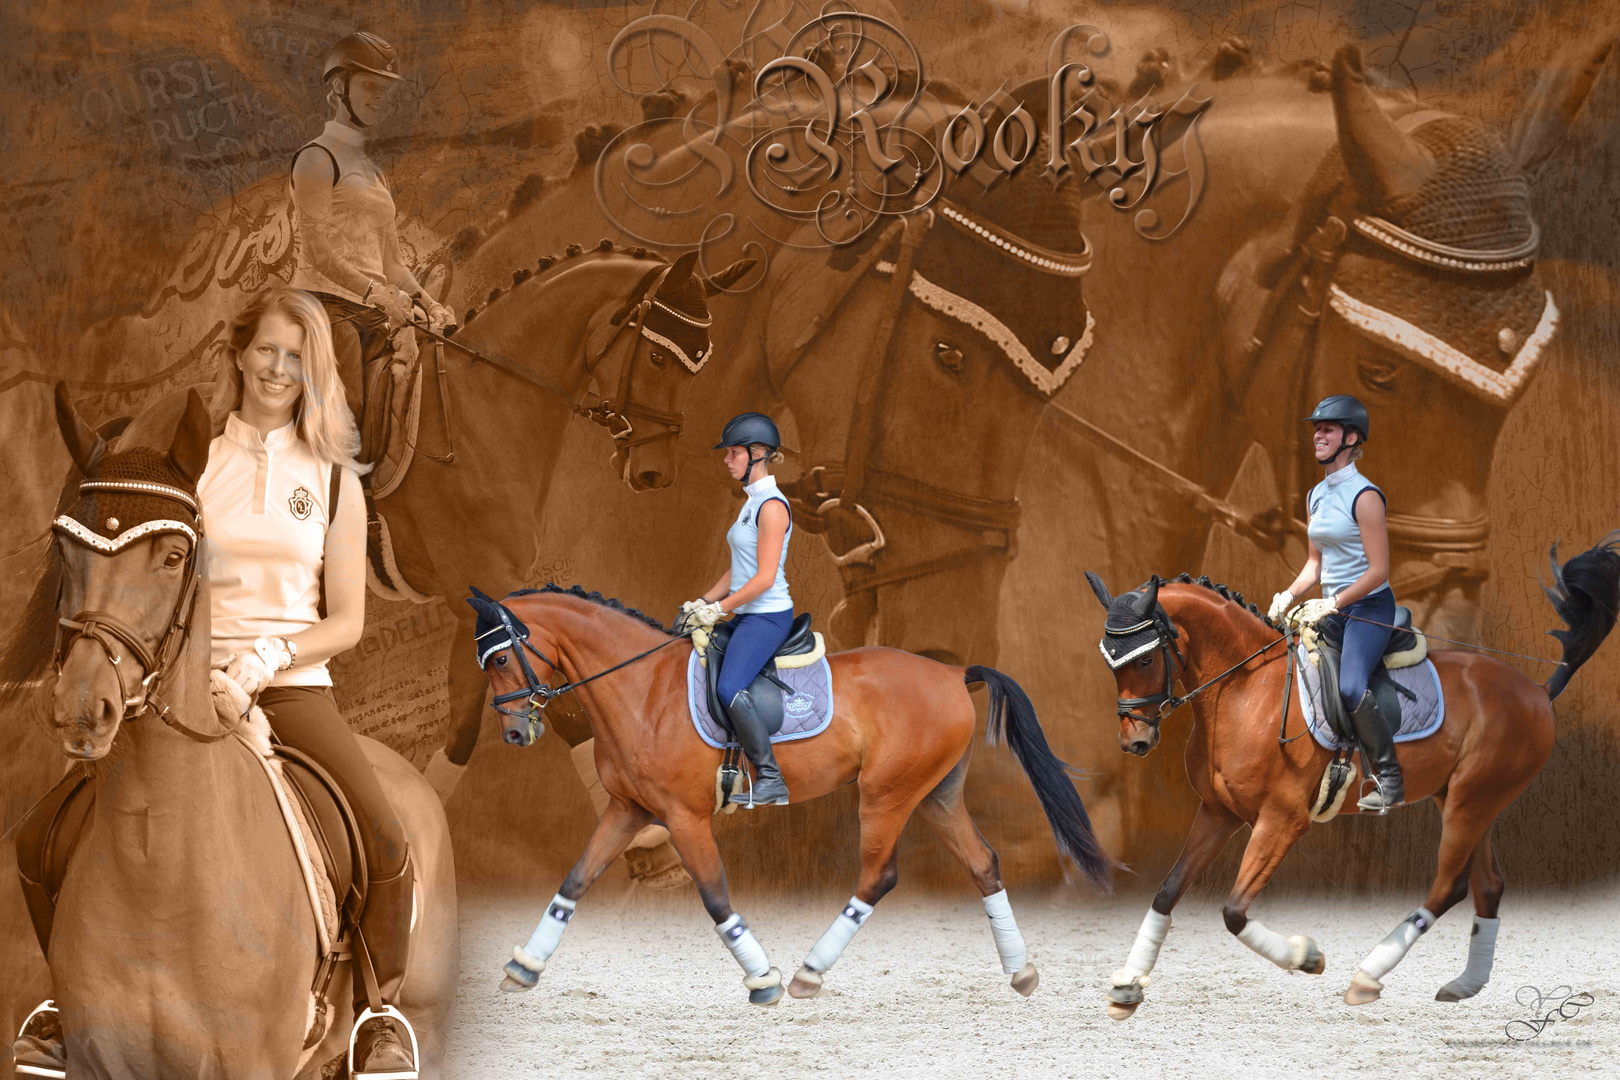 Pferdecollage Rooky